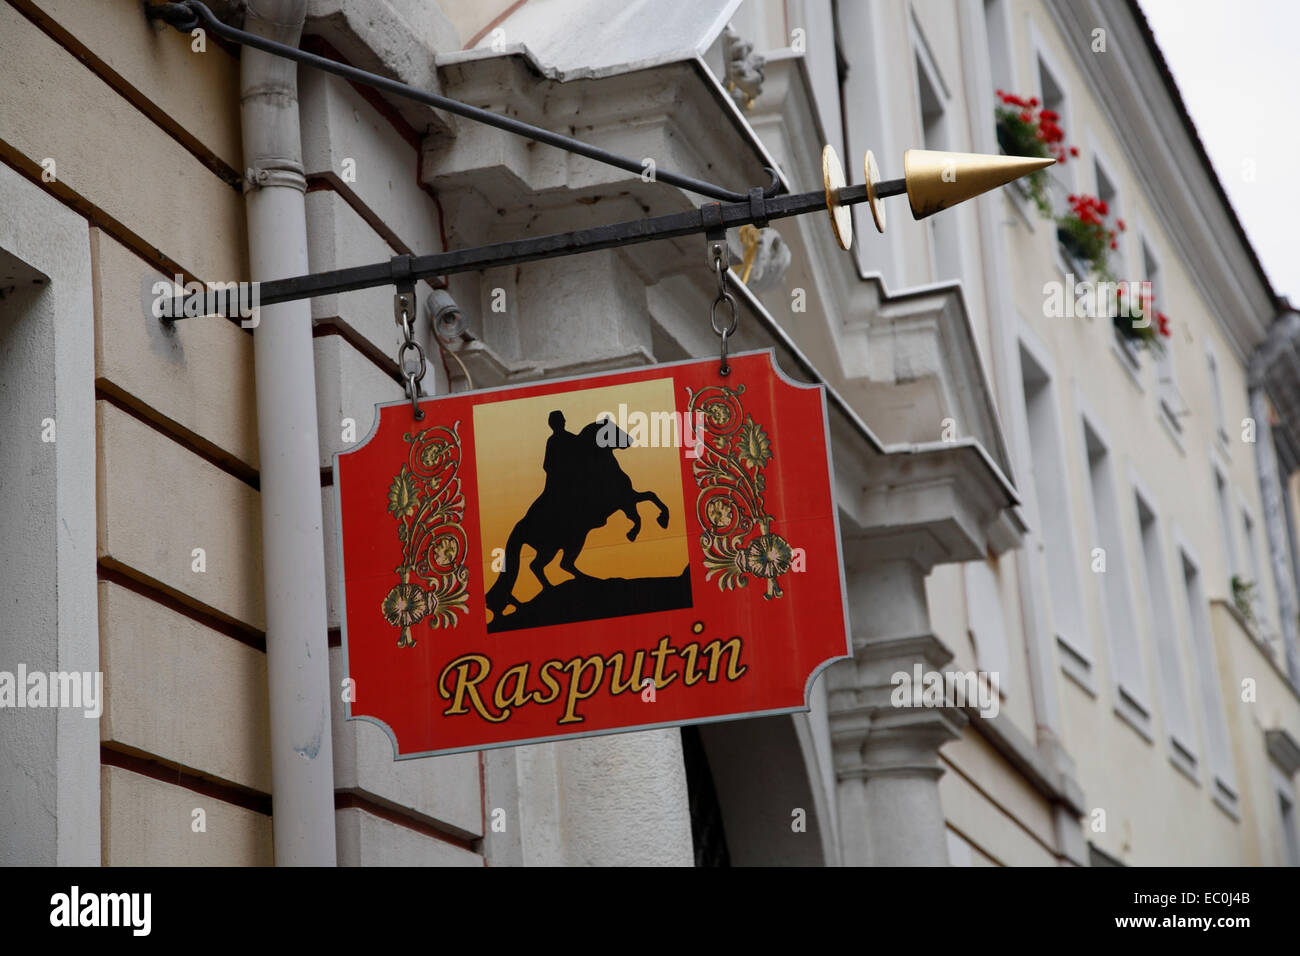 Sign at russian restaurant Rasputin, Goerlitz, Saxony, Germany, Europe - Stock Image